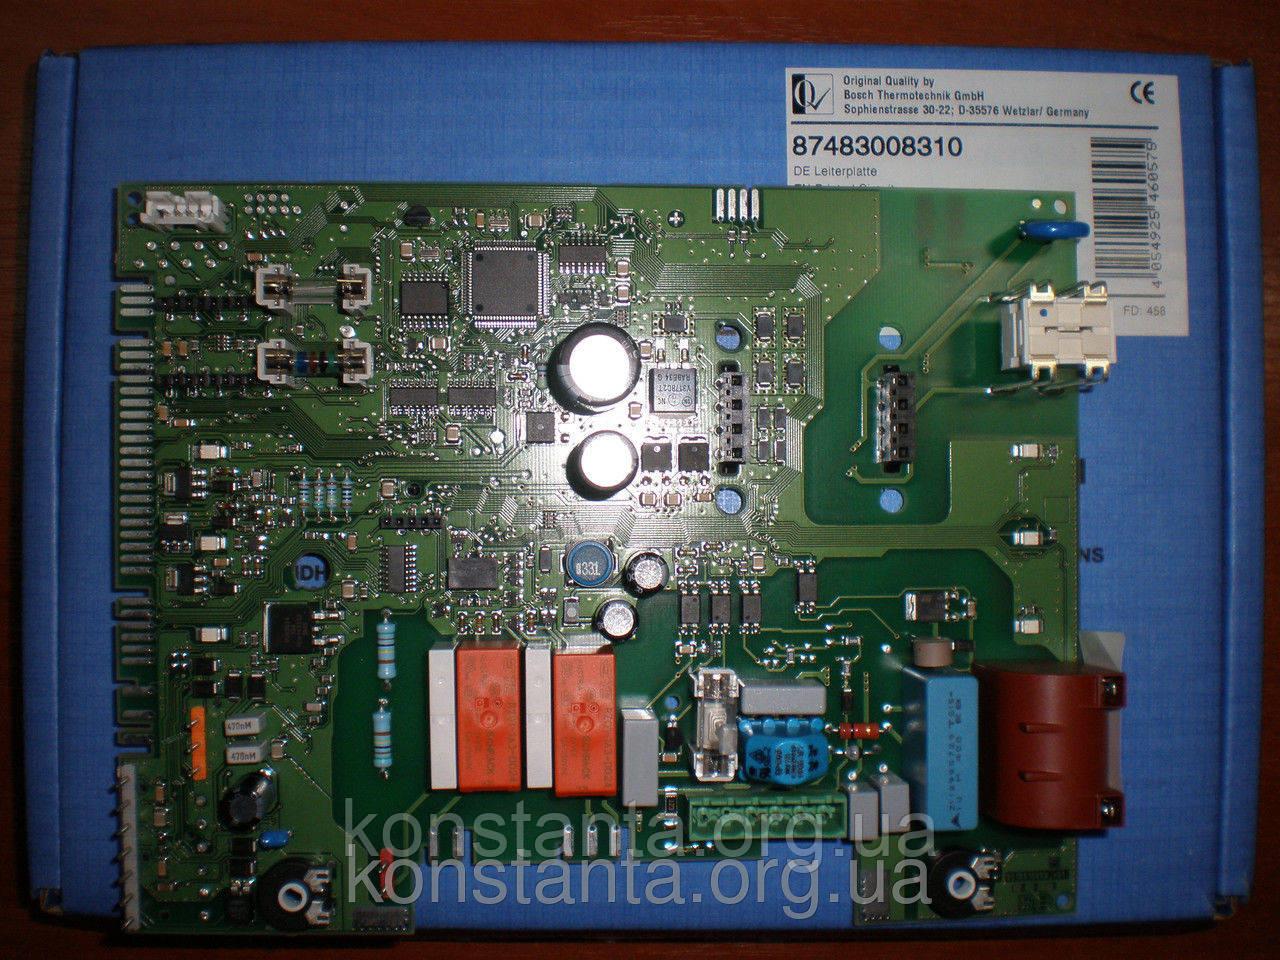 Электронная плата для котлов  Bosch-Junkers ZWC24-3 MFA, ZSC24-3 MFA  - Интернет-магазин KONSTANTA в Харькове